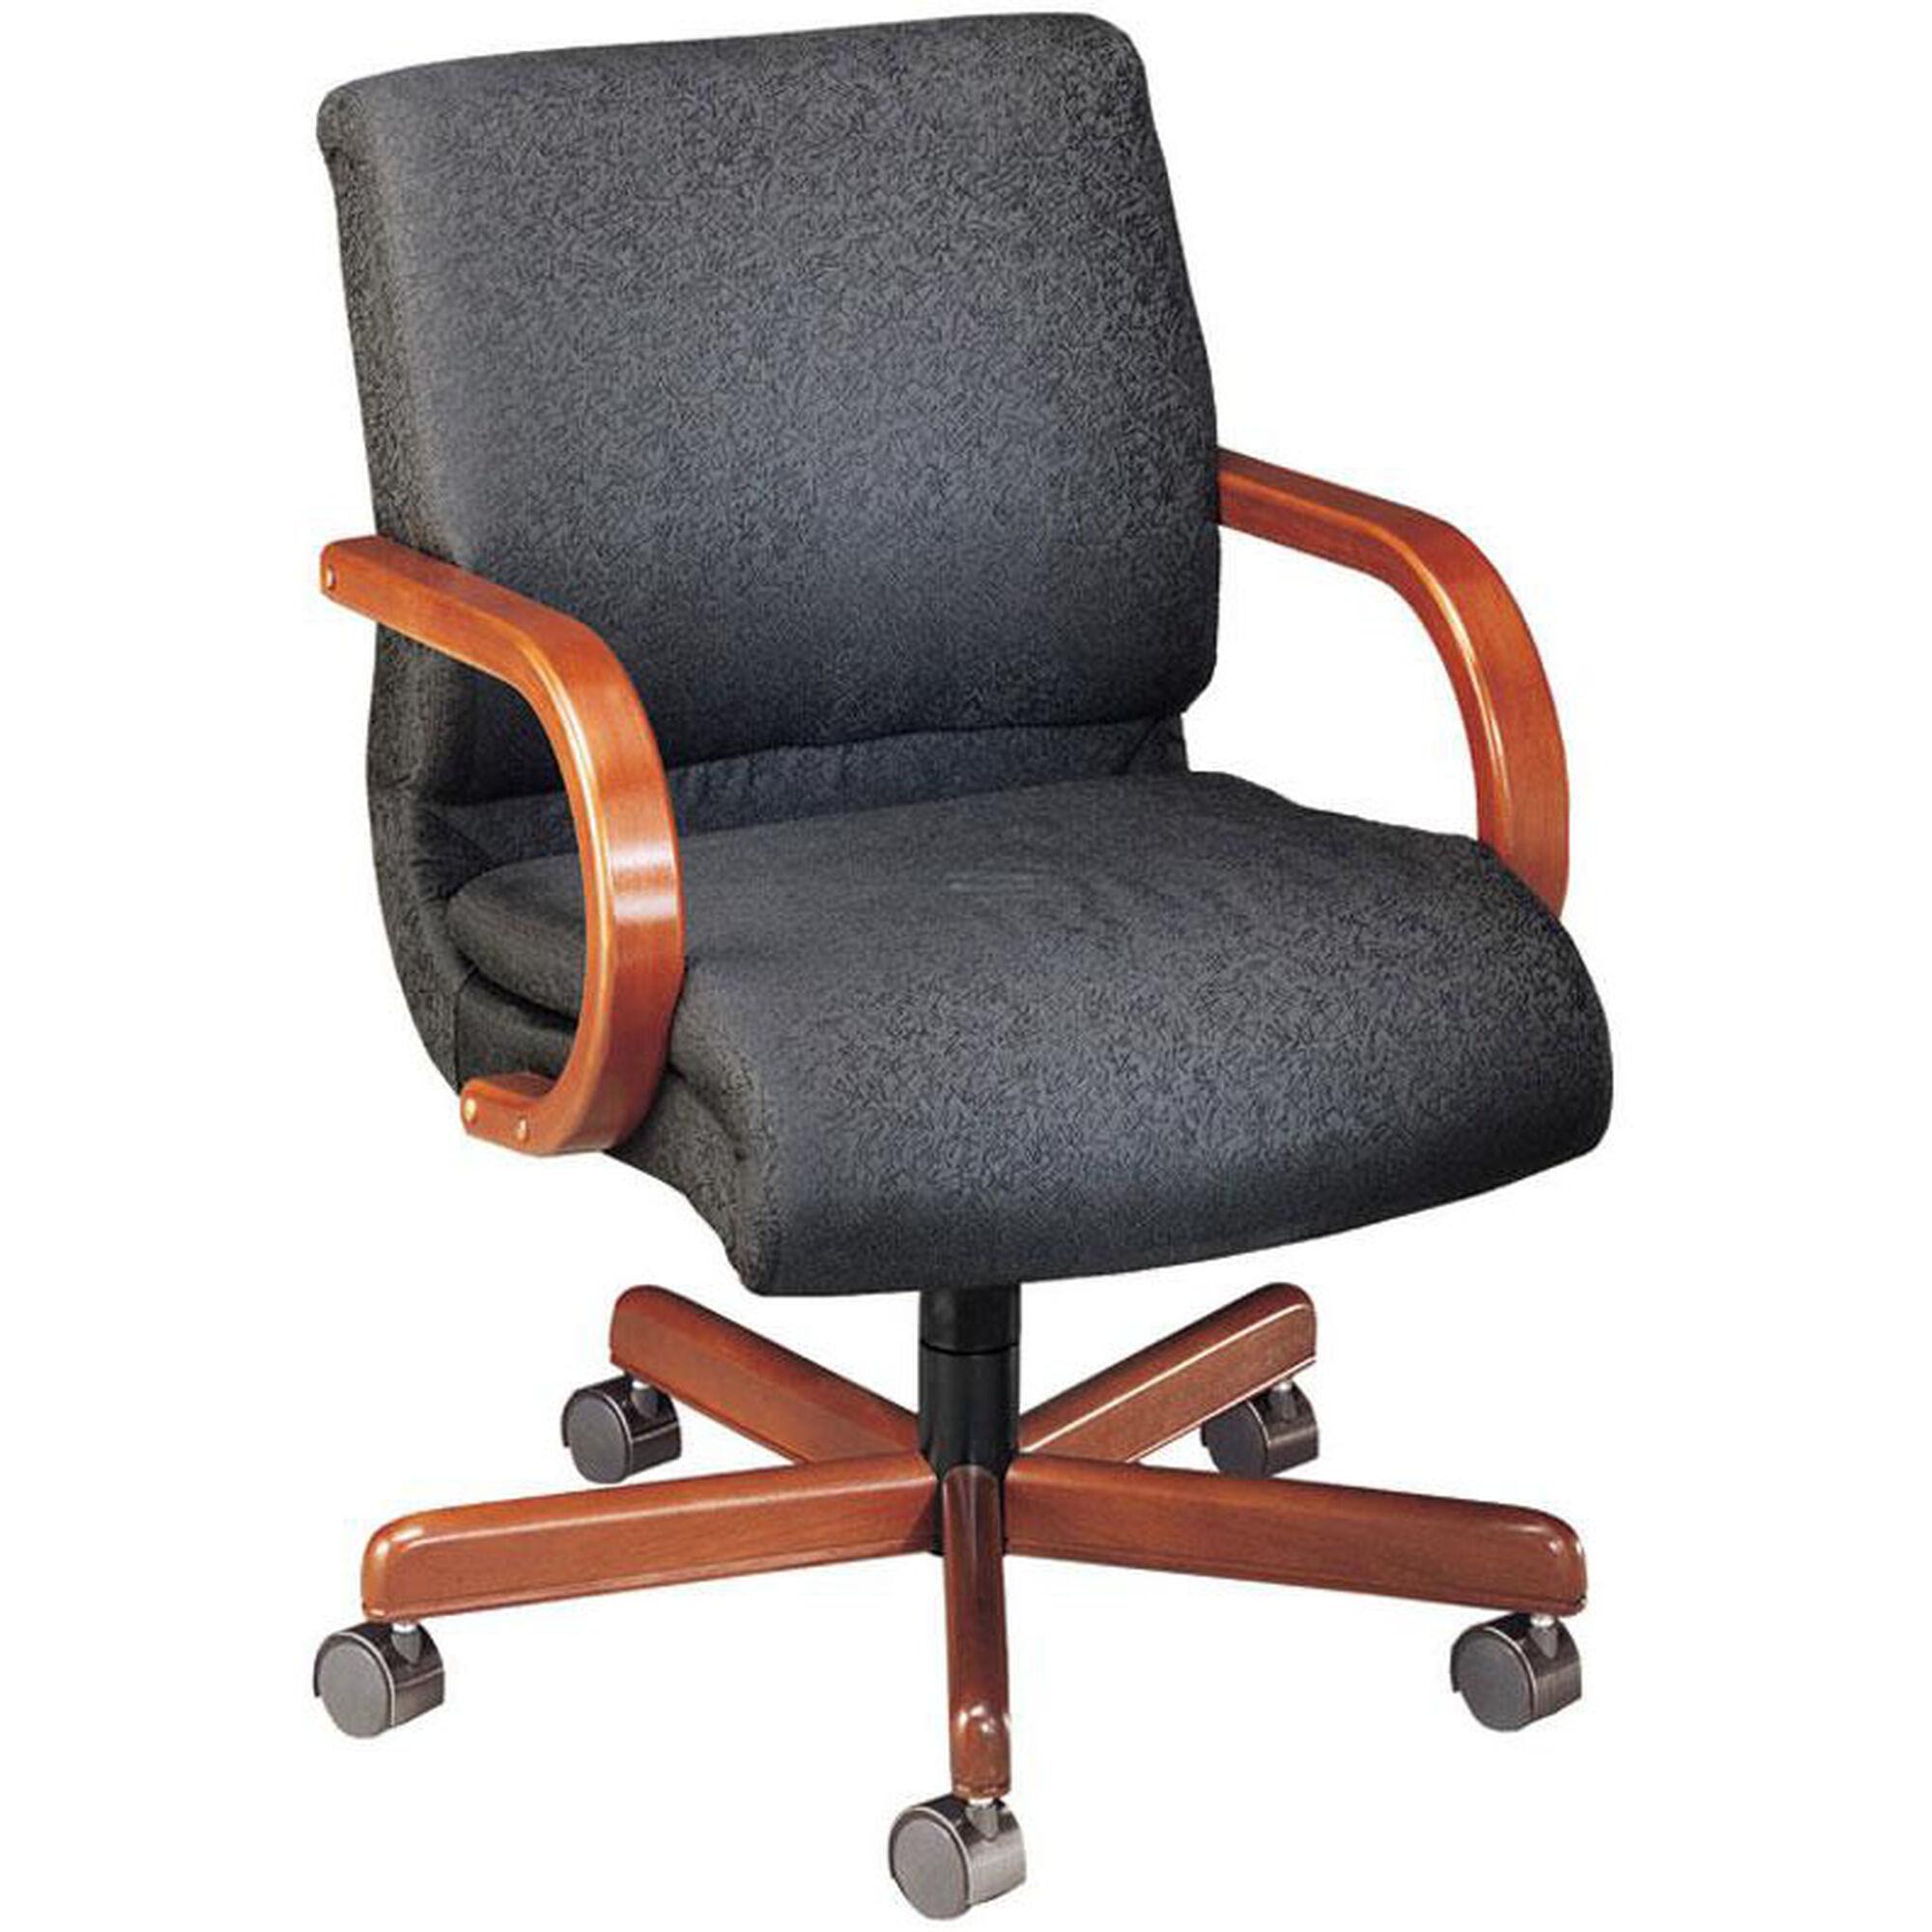 High Point Furniture Industries 1217 Hpf